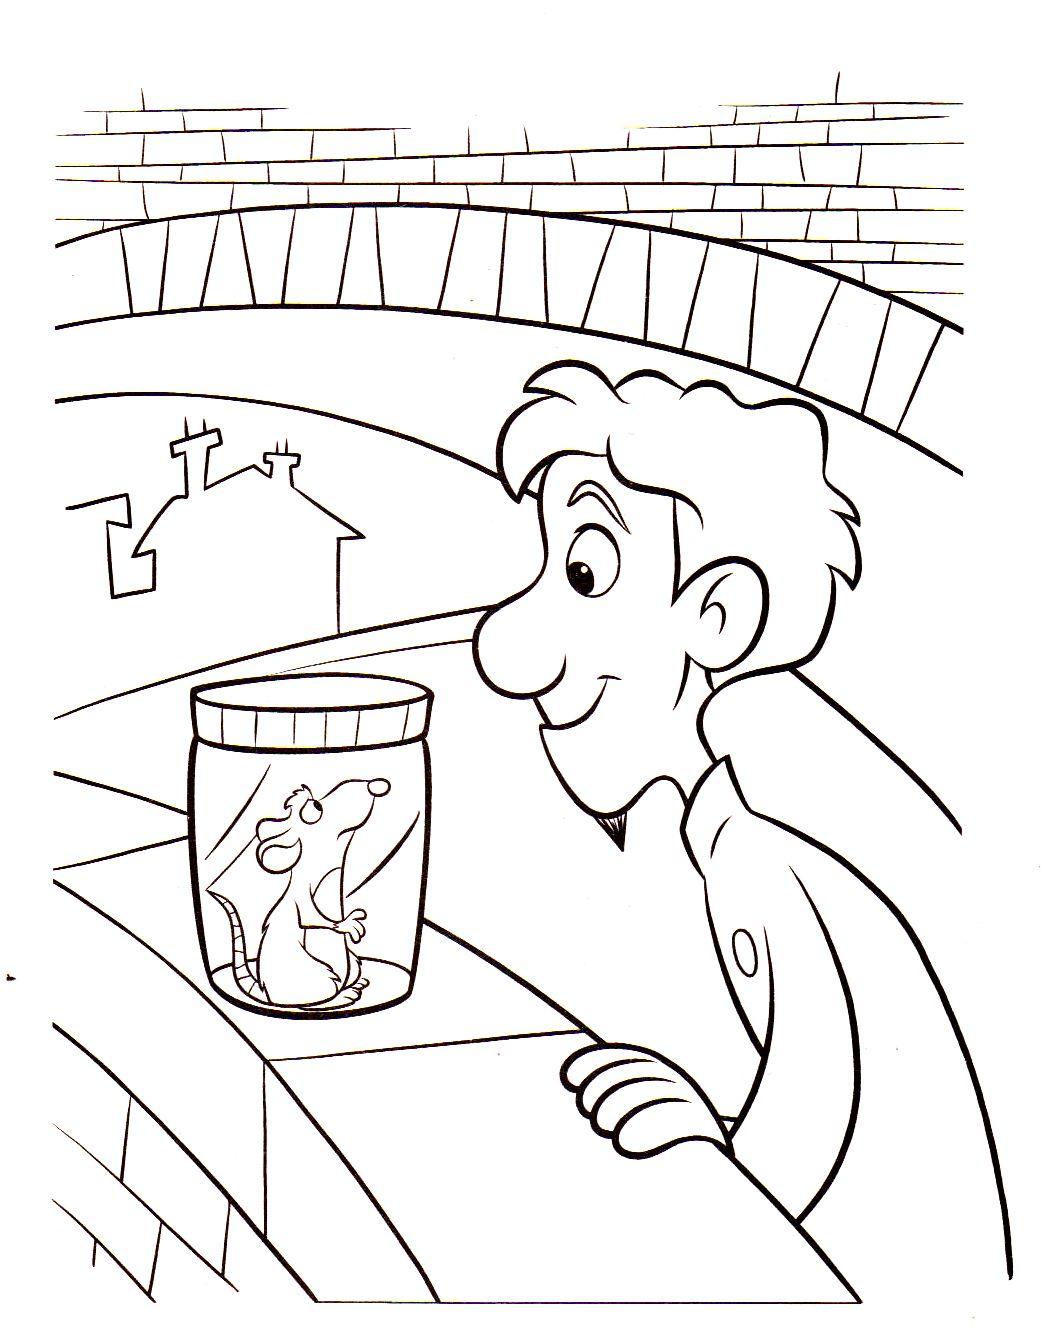 Dessin gratuit ratatouille imprimer - Coloriage ratatouille ...